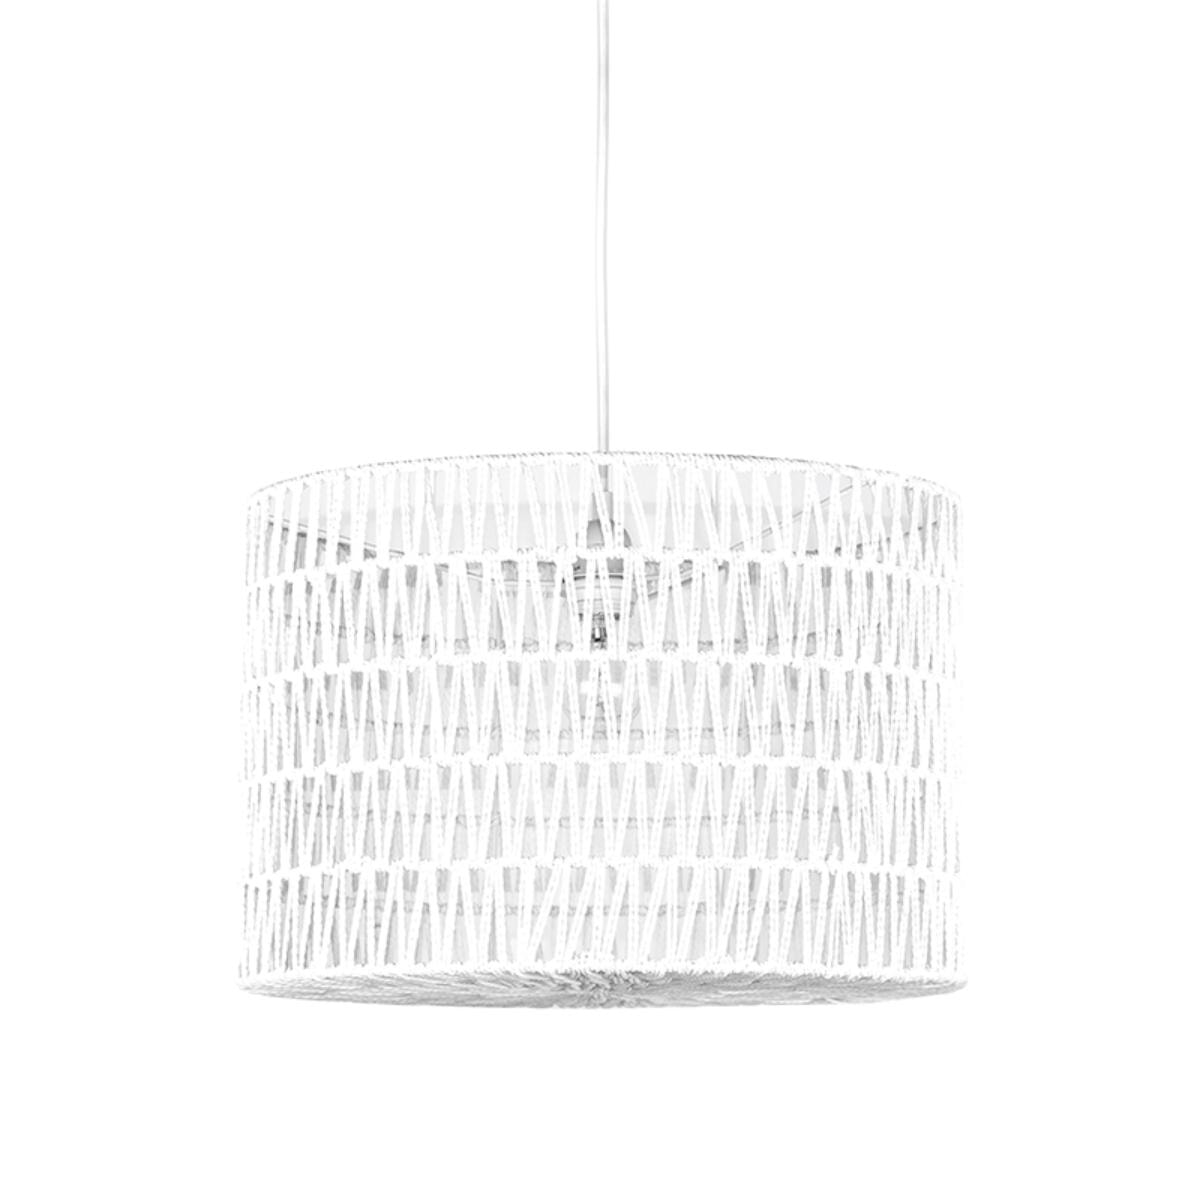 LABEL51 hanglamp 'Stripe' 45cm, kleur wit